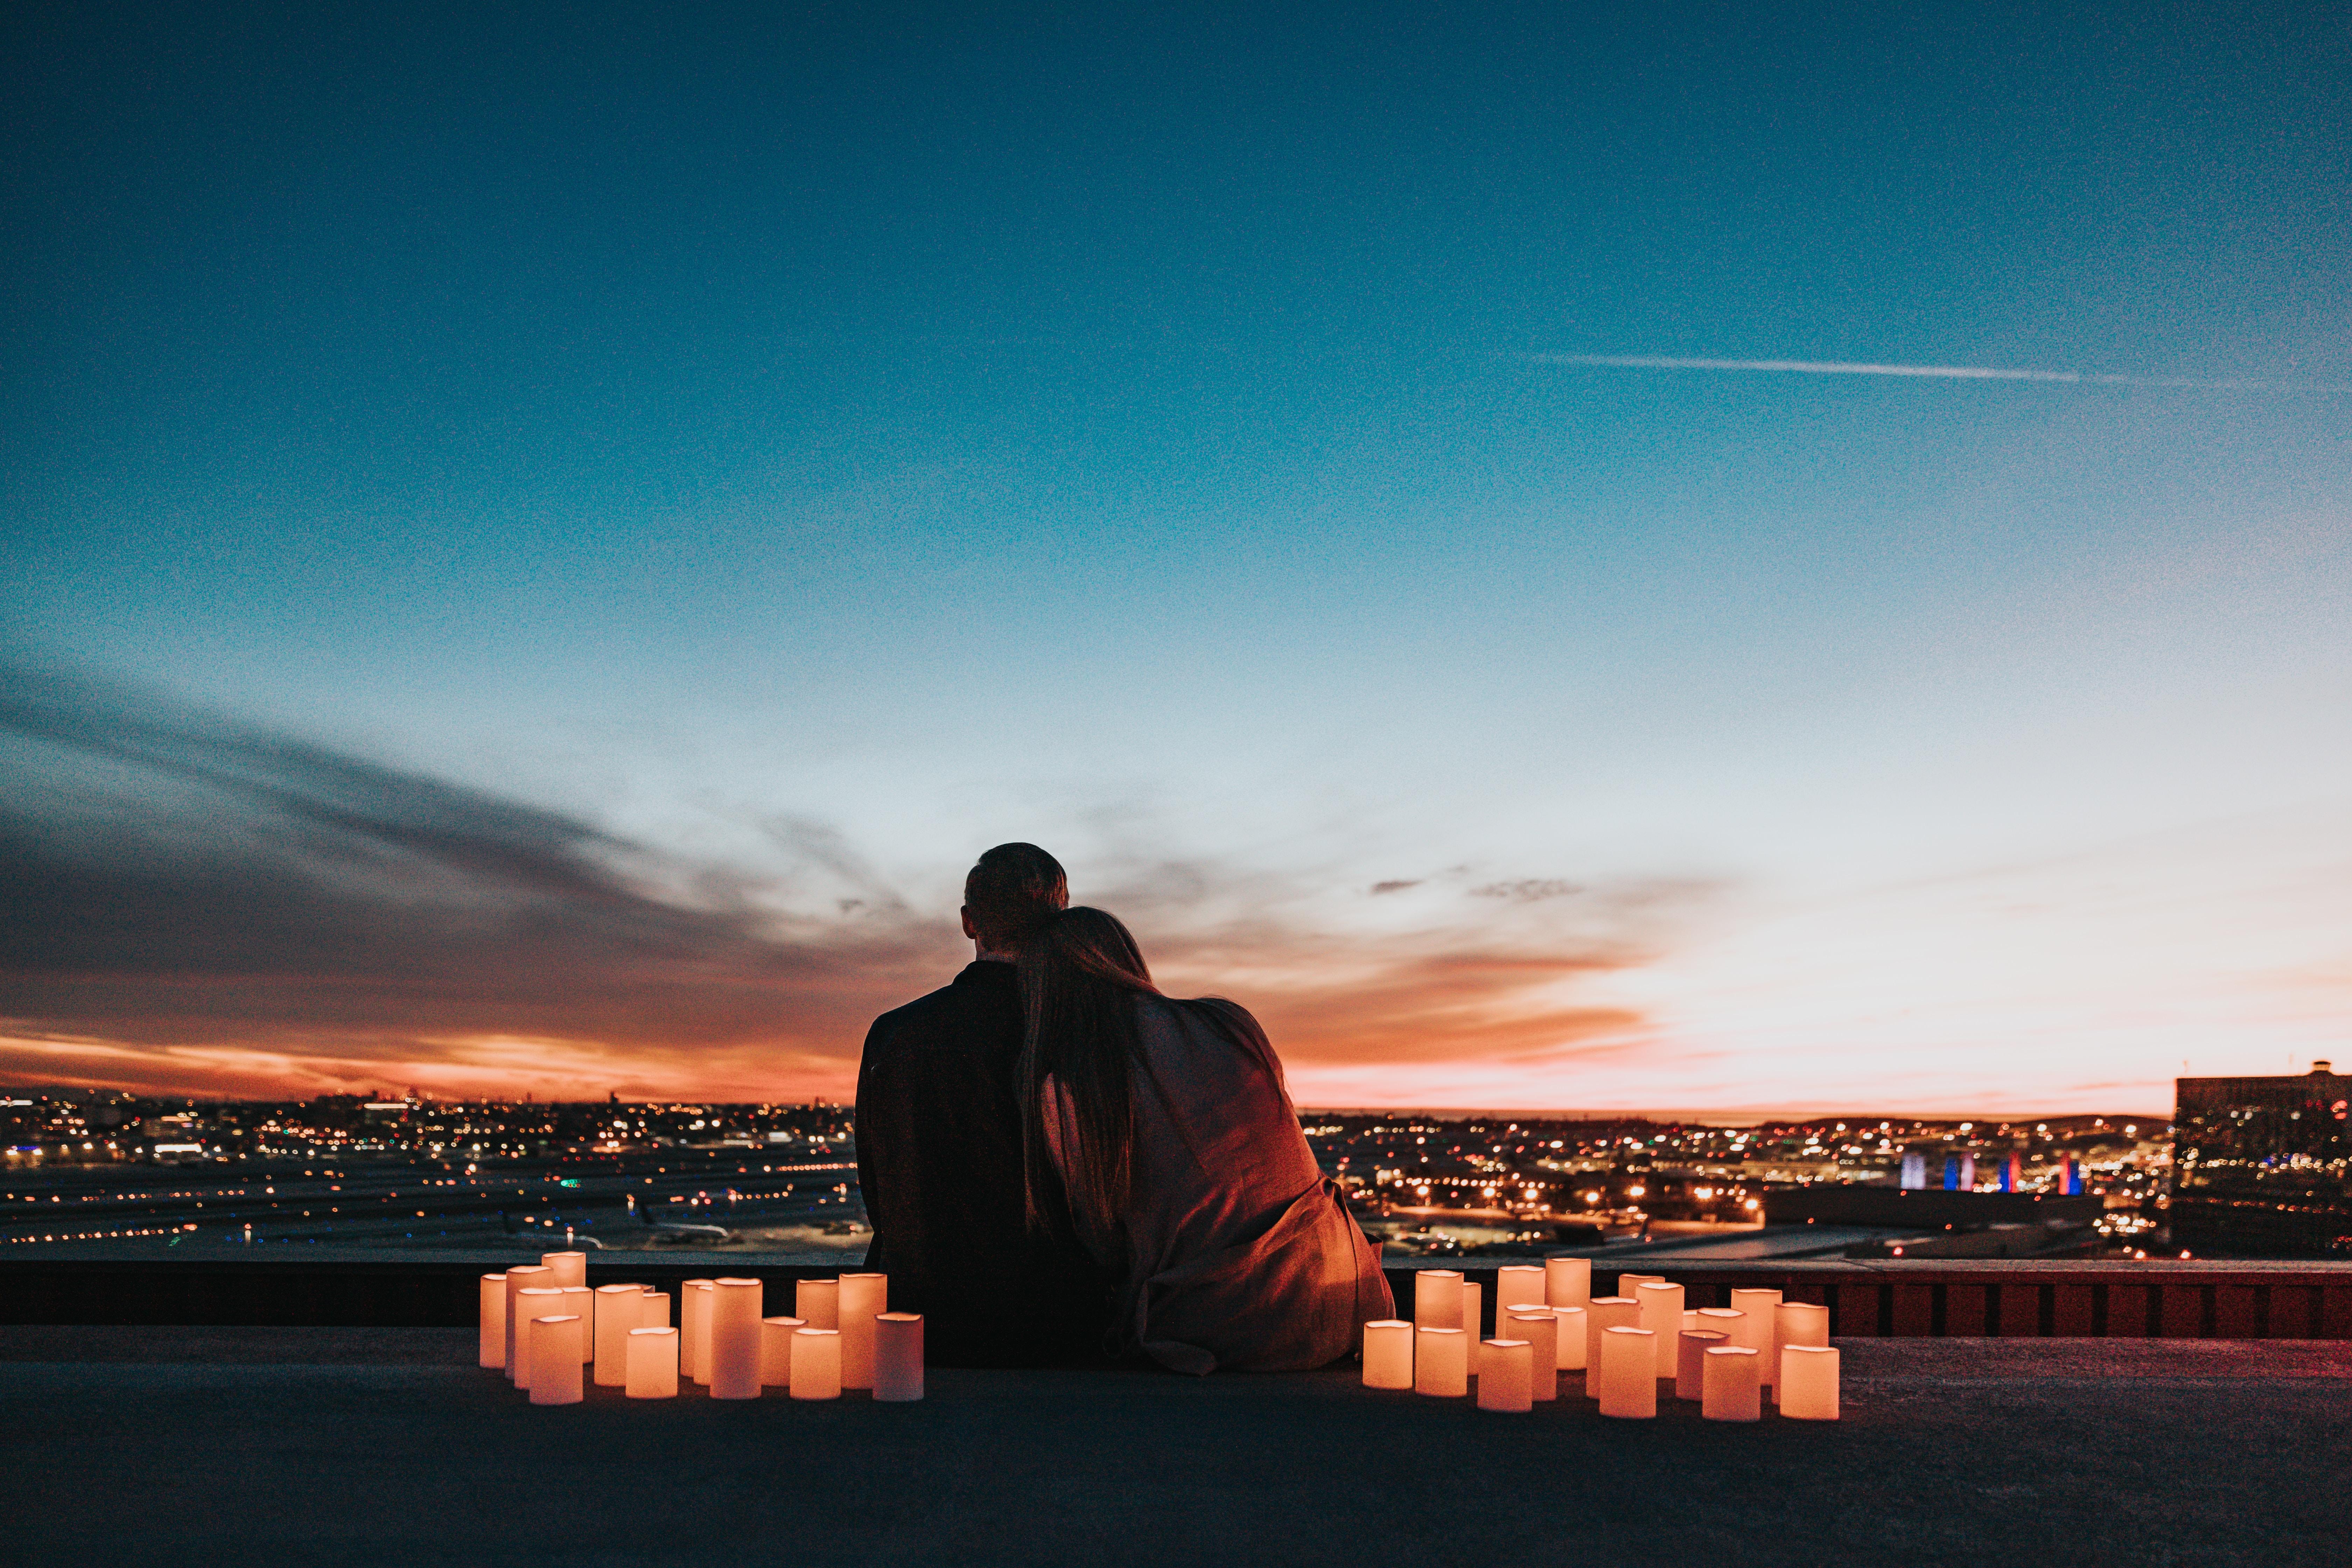 la fase romántica se prolonga